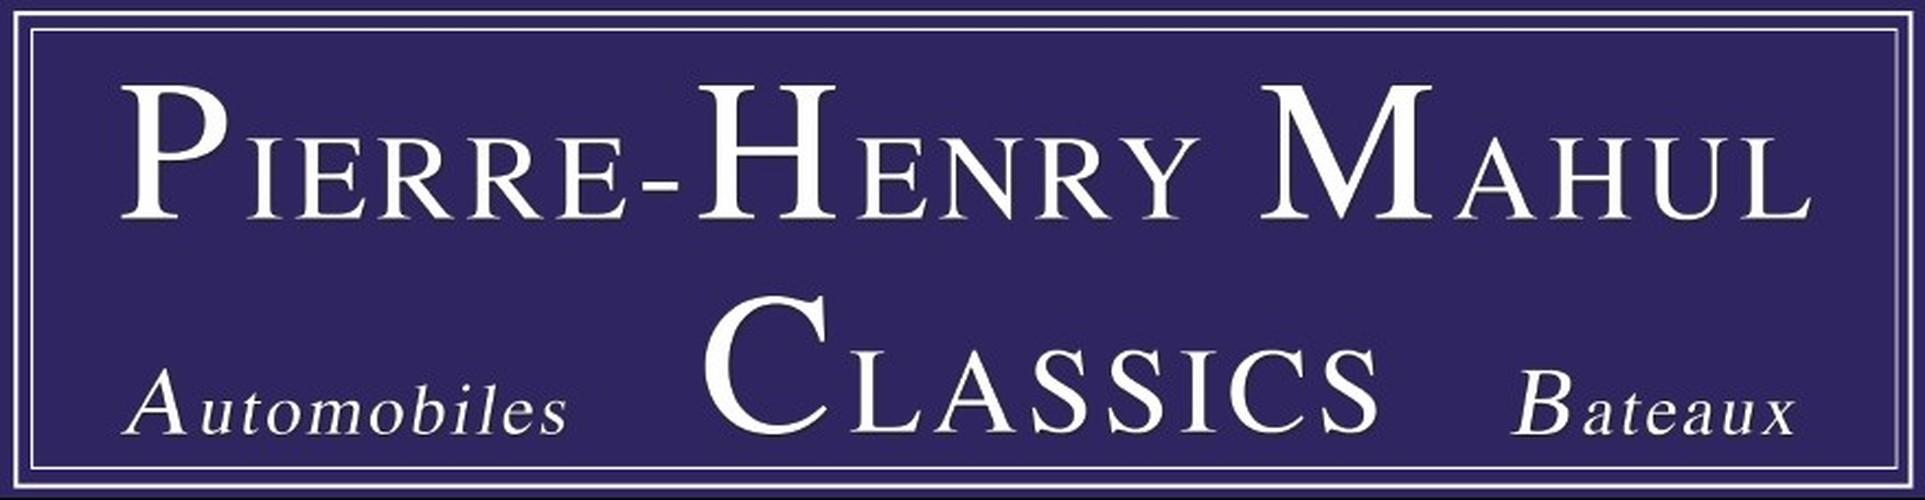 Pierre-Henry Mahul Cla...